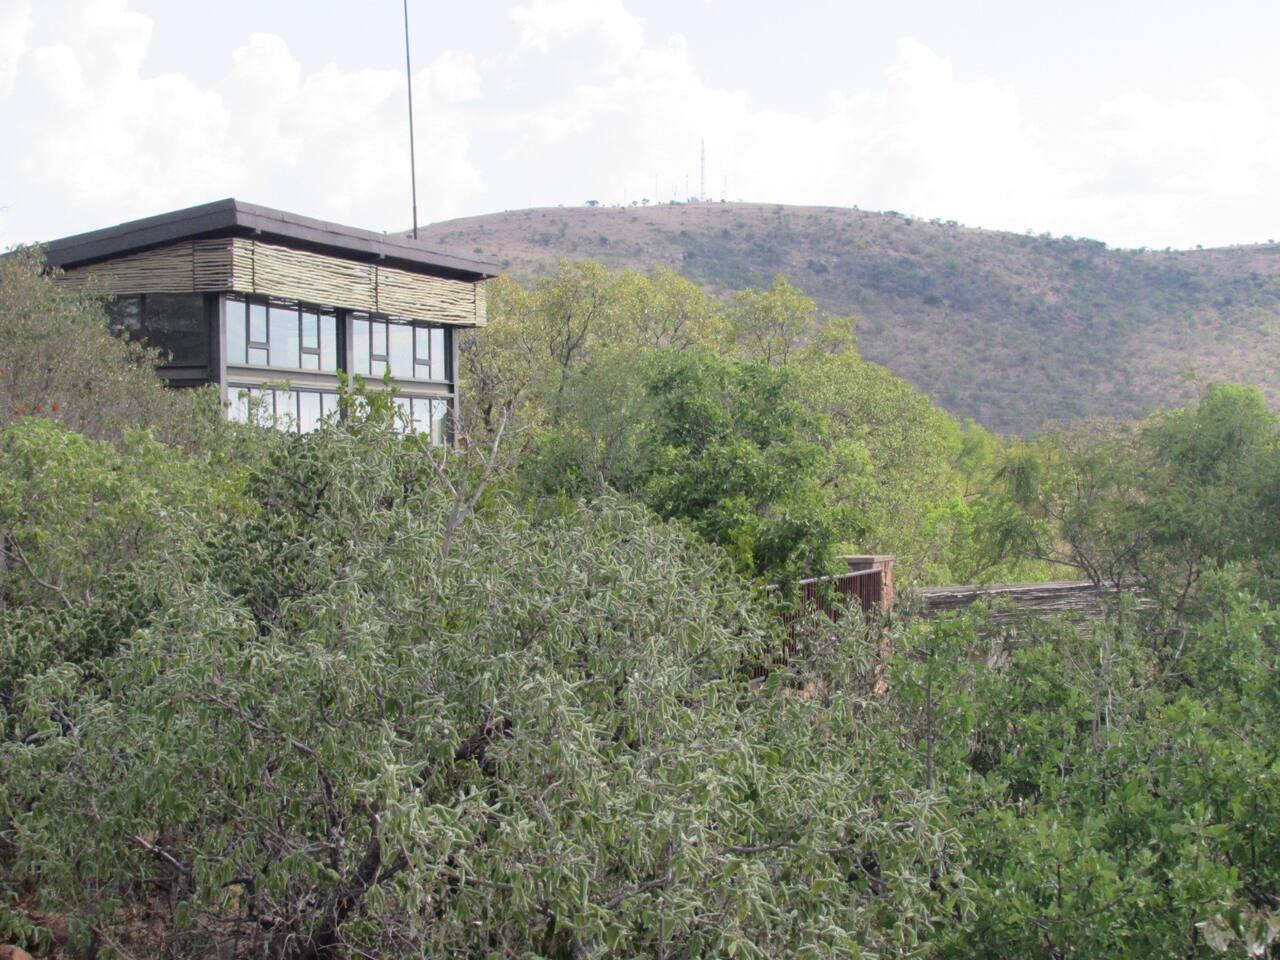 Treetop main house view